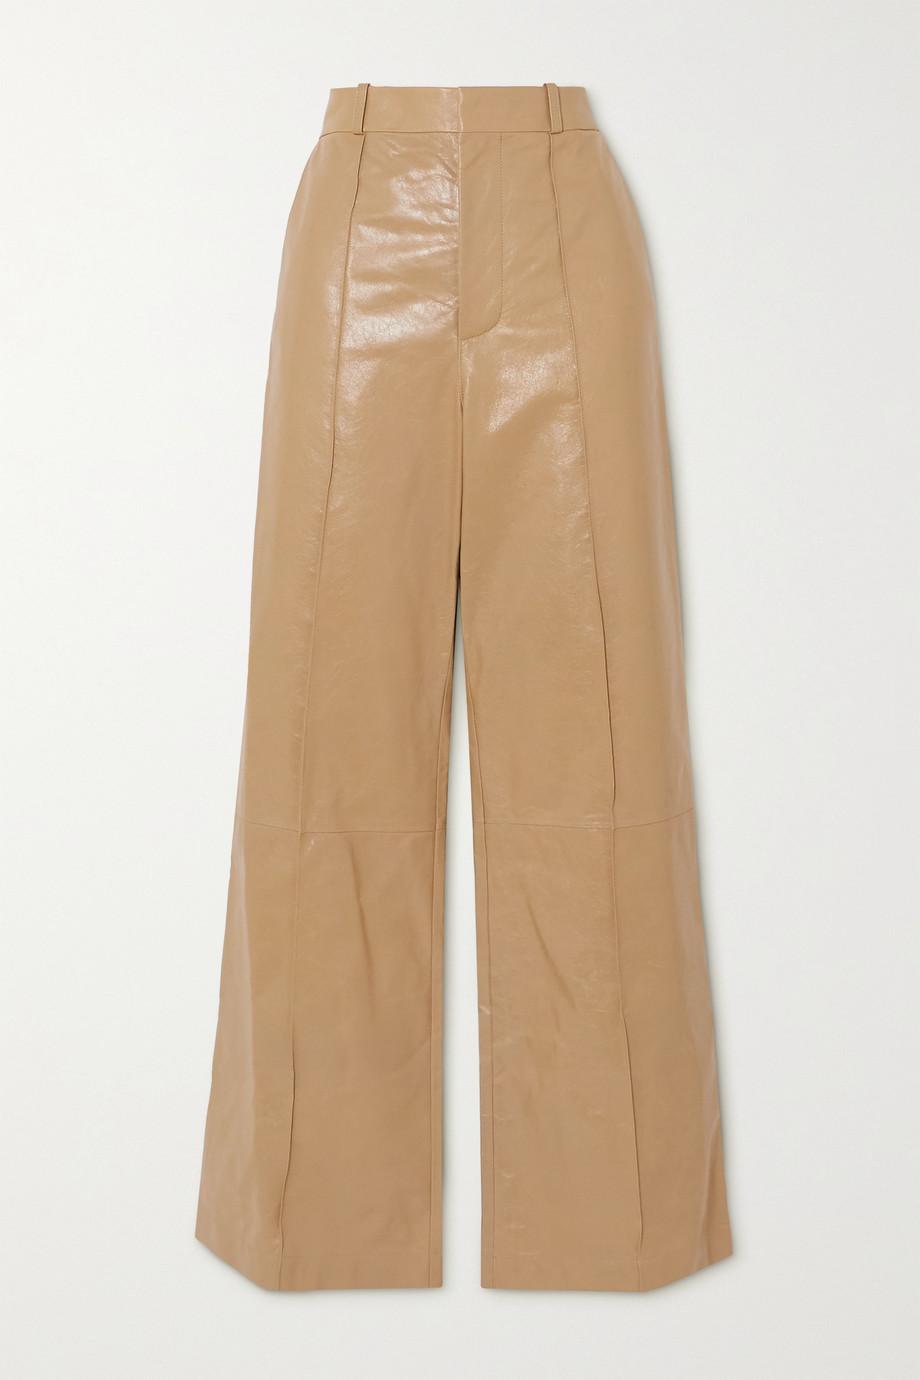 Marni Pintucked leather wide-leg pants